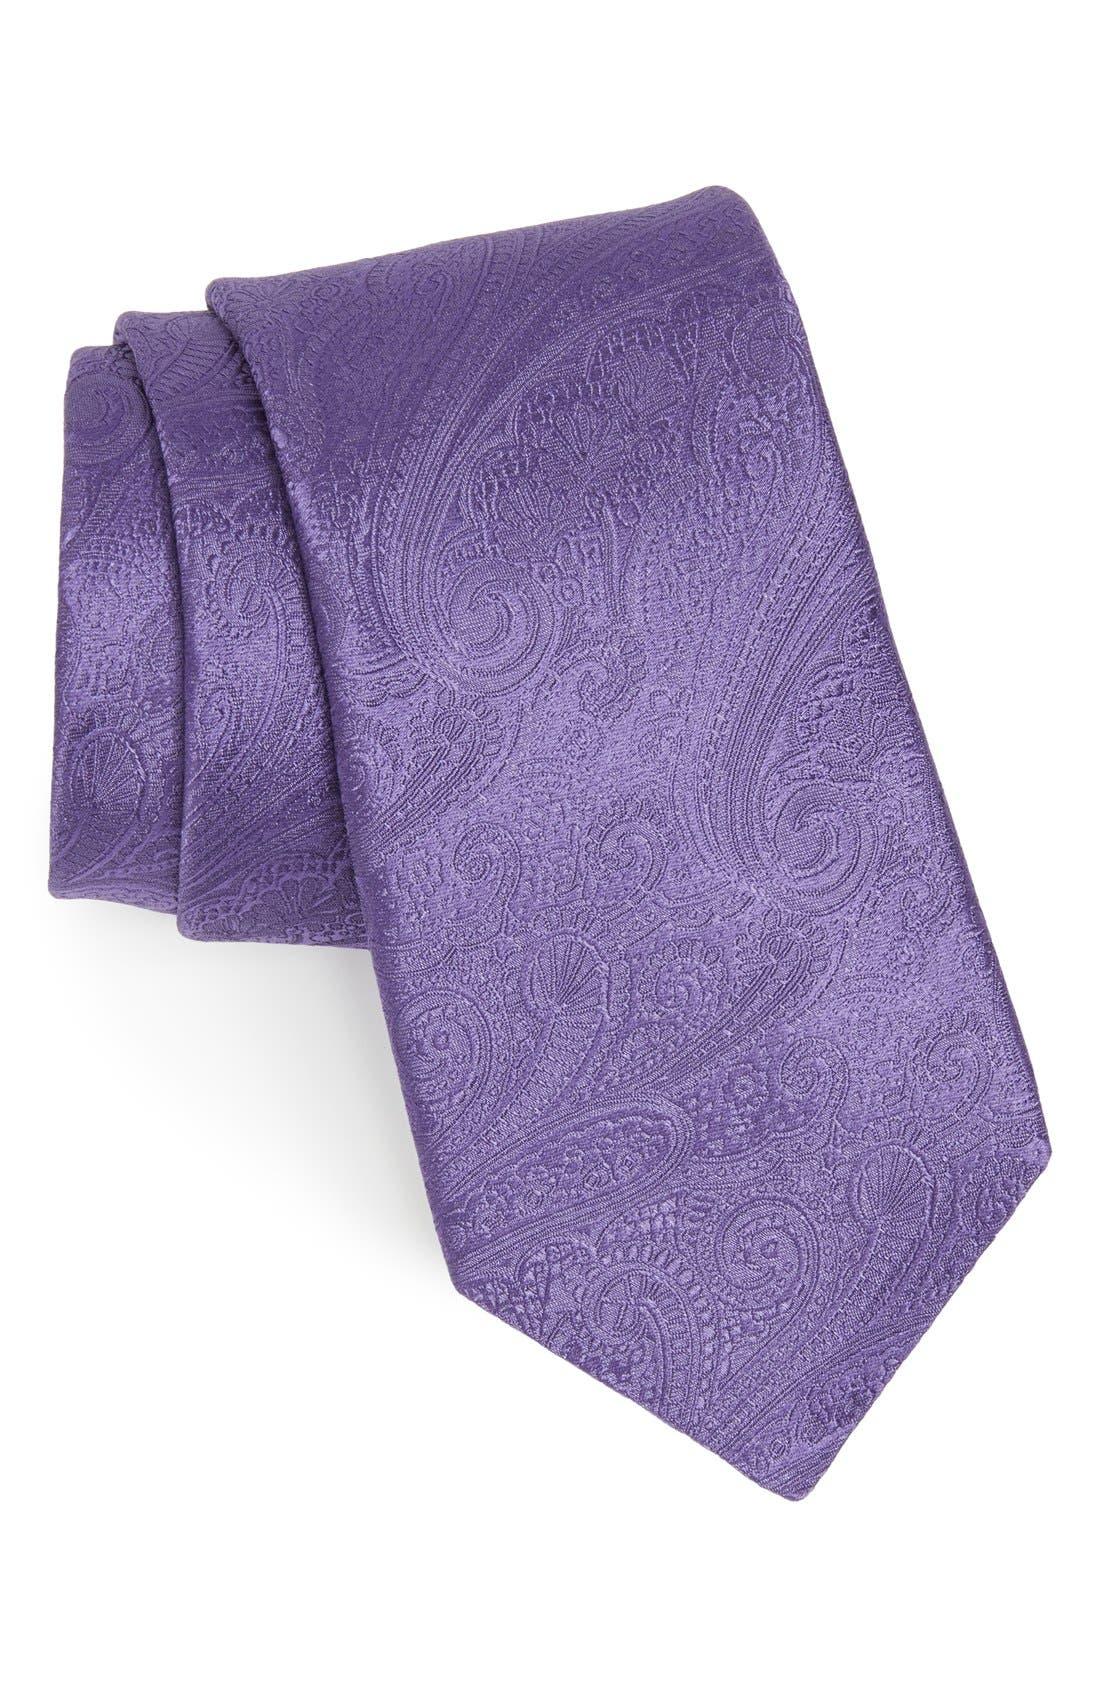 Main Image - Michael Kors Paisley Woven Silk Tie